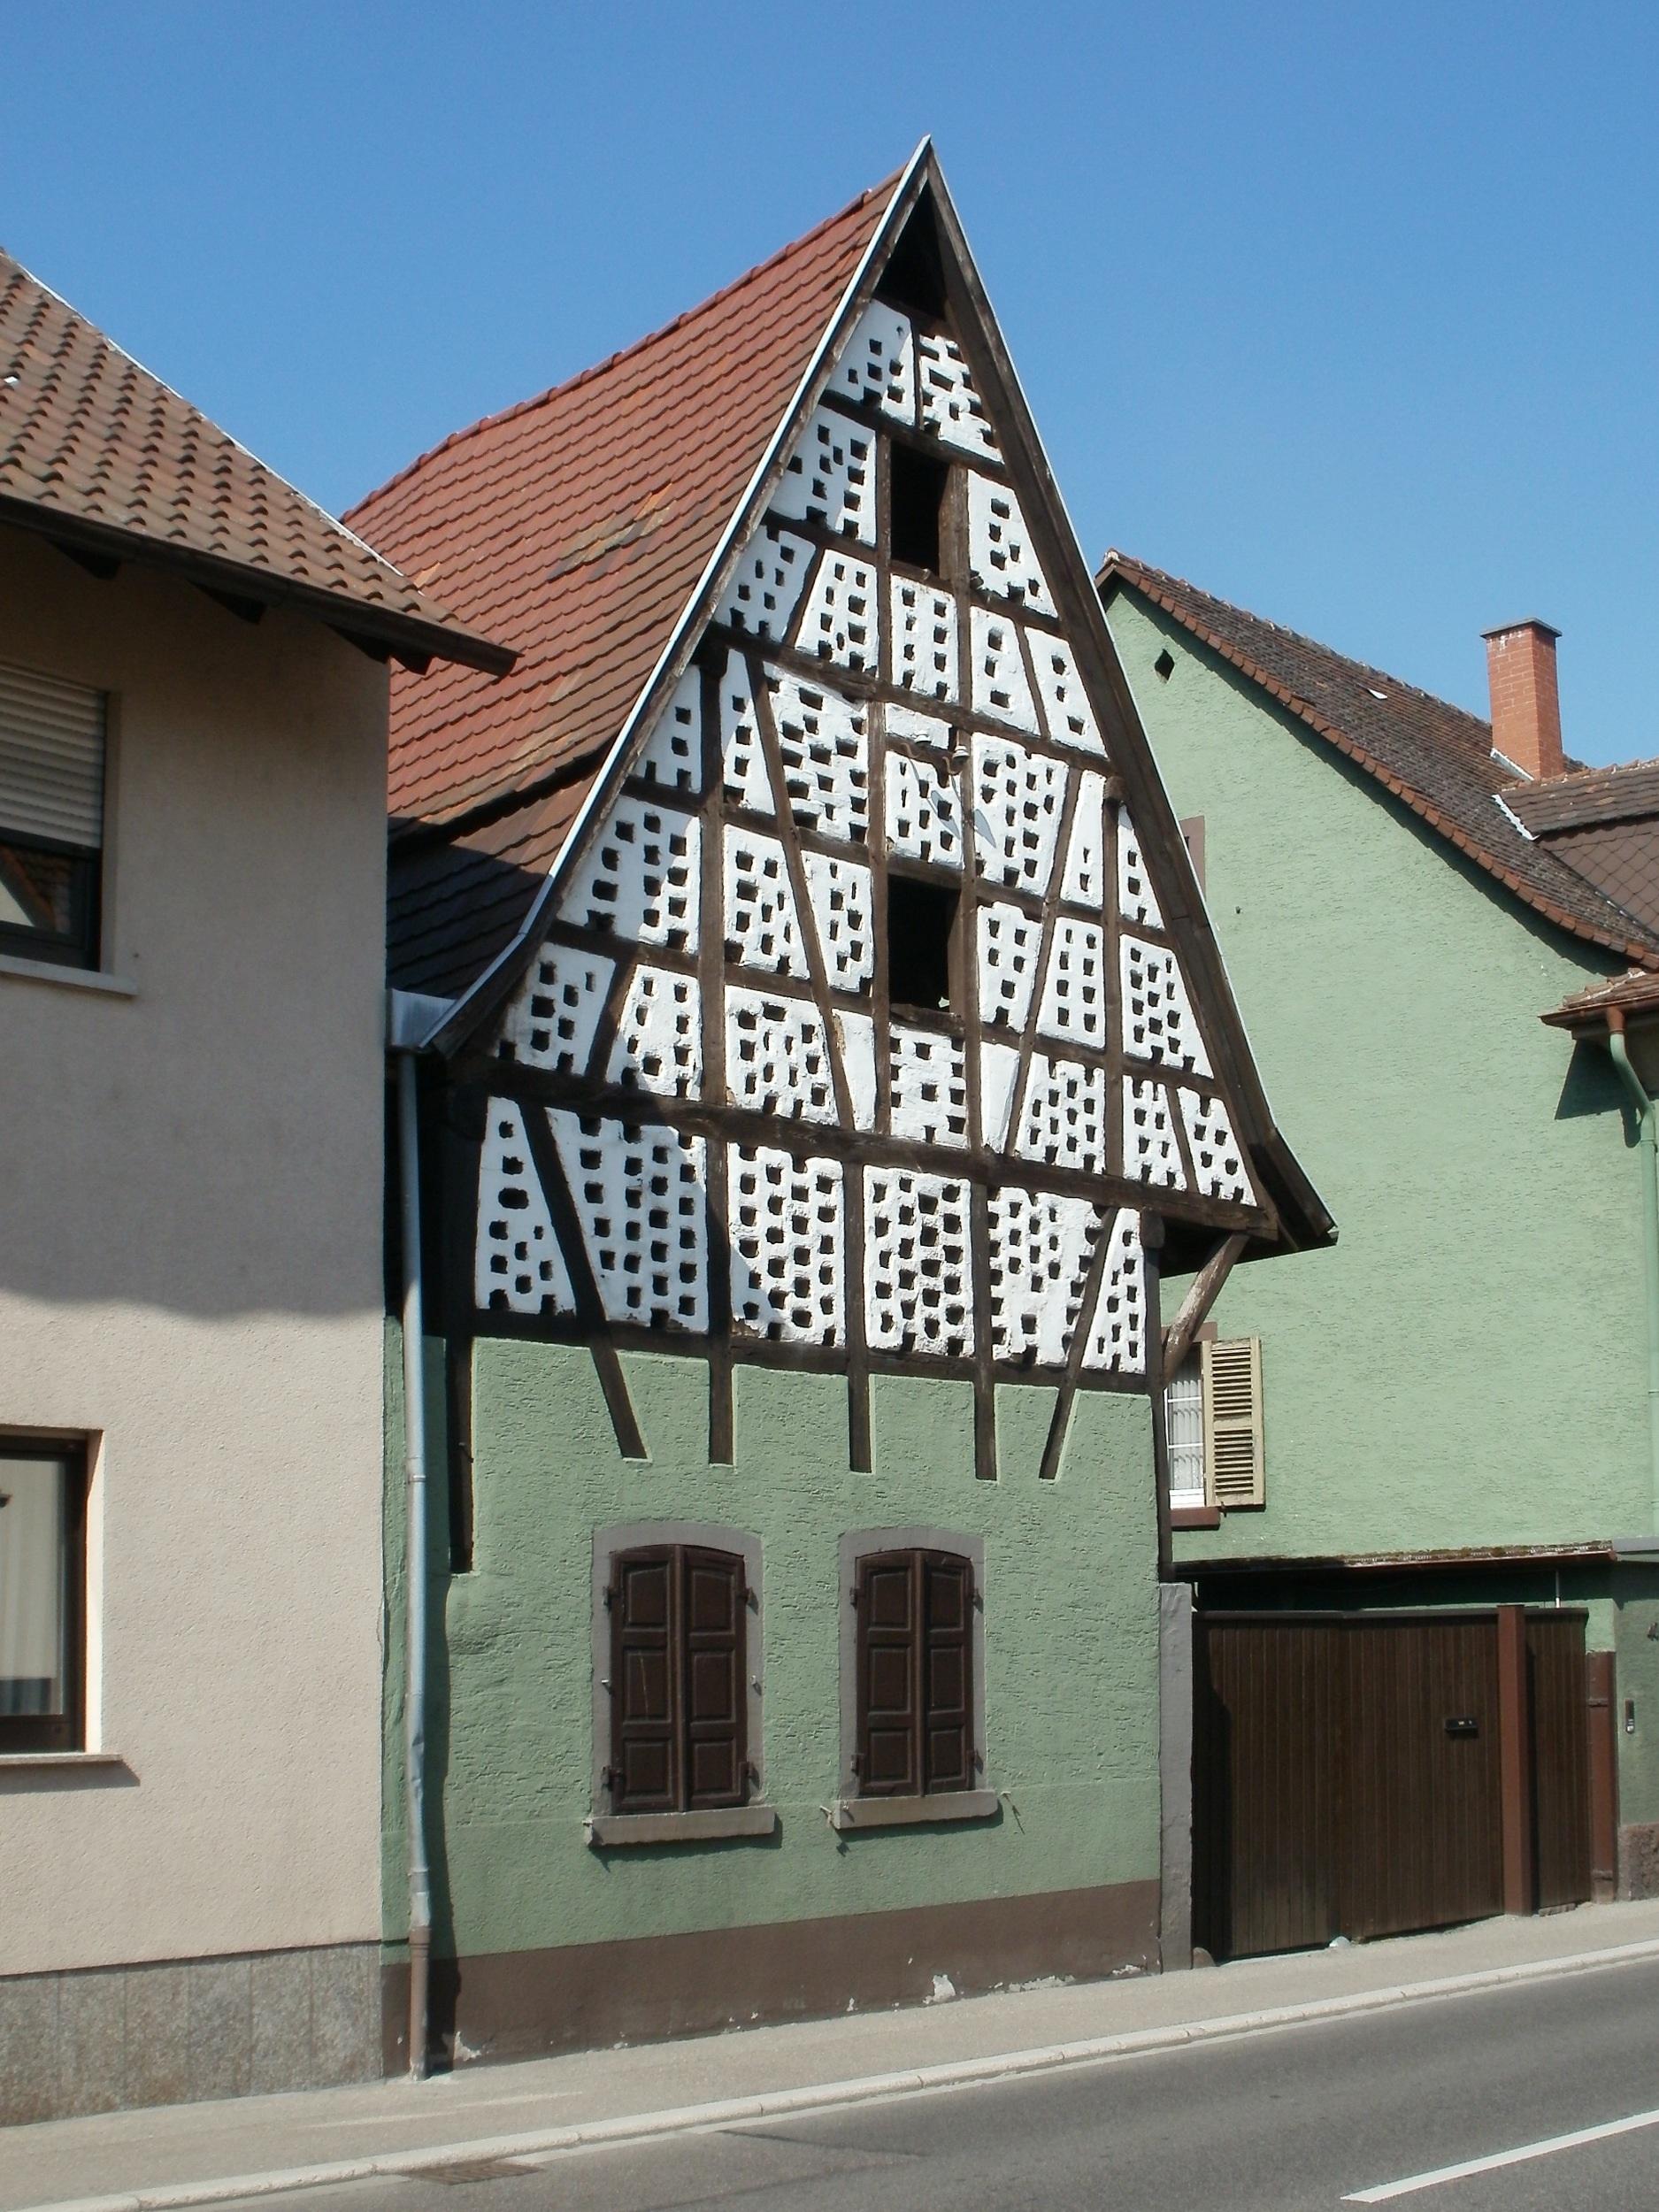 Fotos gratis : arquitectura, estructura, casa, ventana, pueblo ...